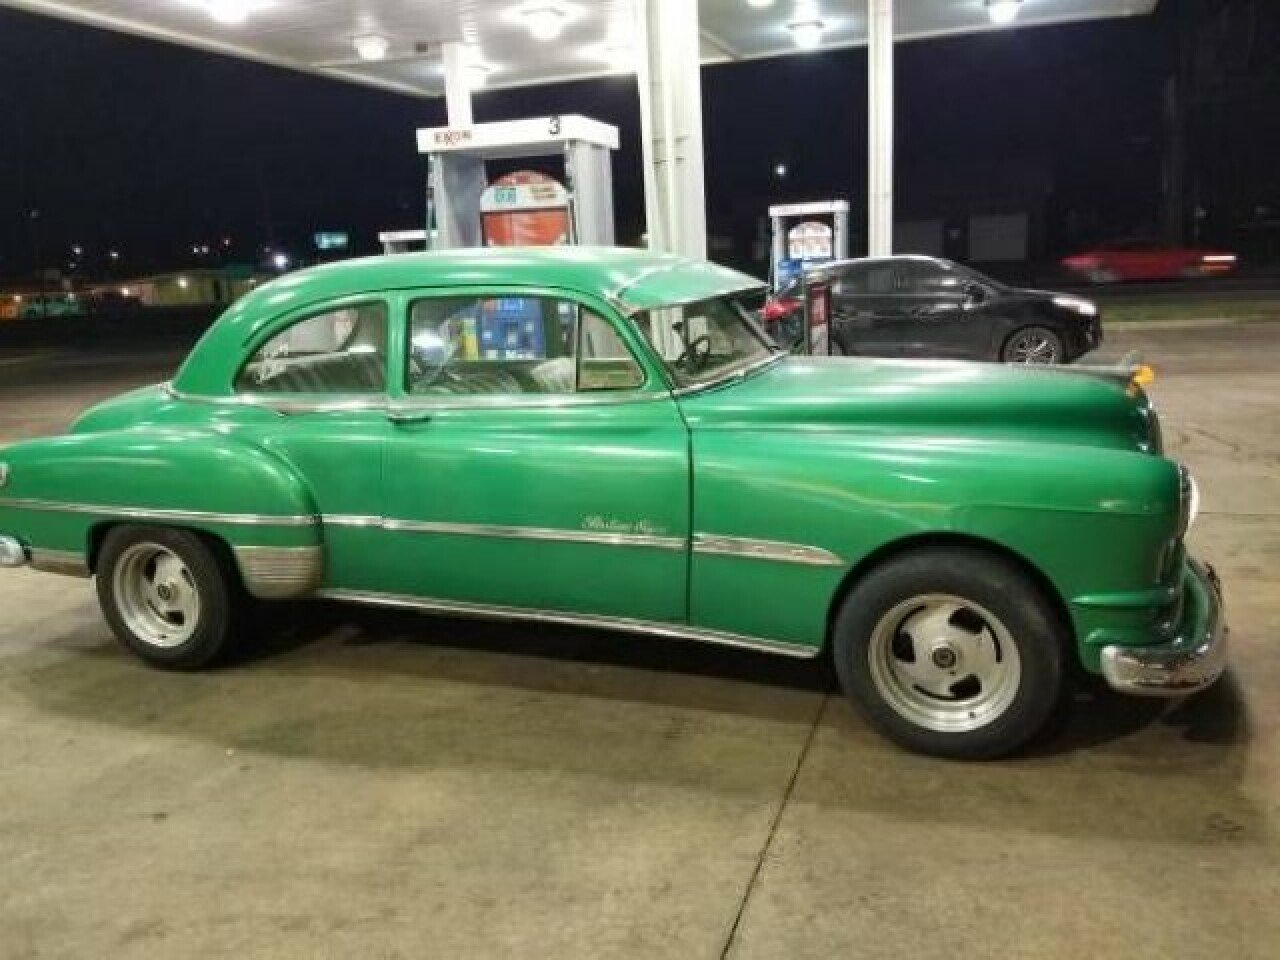 1951 Pontiac Coupe For Sale: 1951 Pontiac Chieftain For Sale Near Cadillac, Michigan